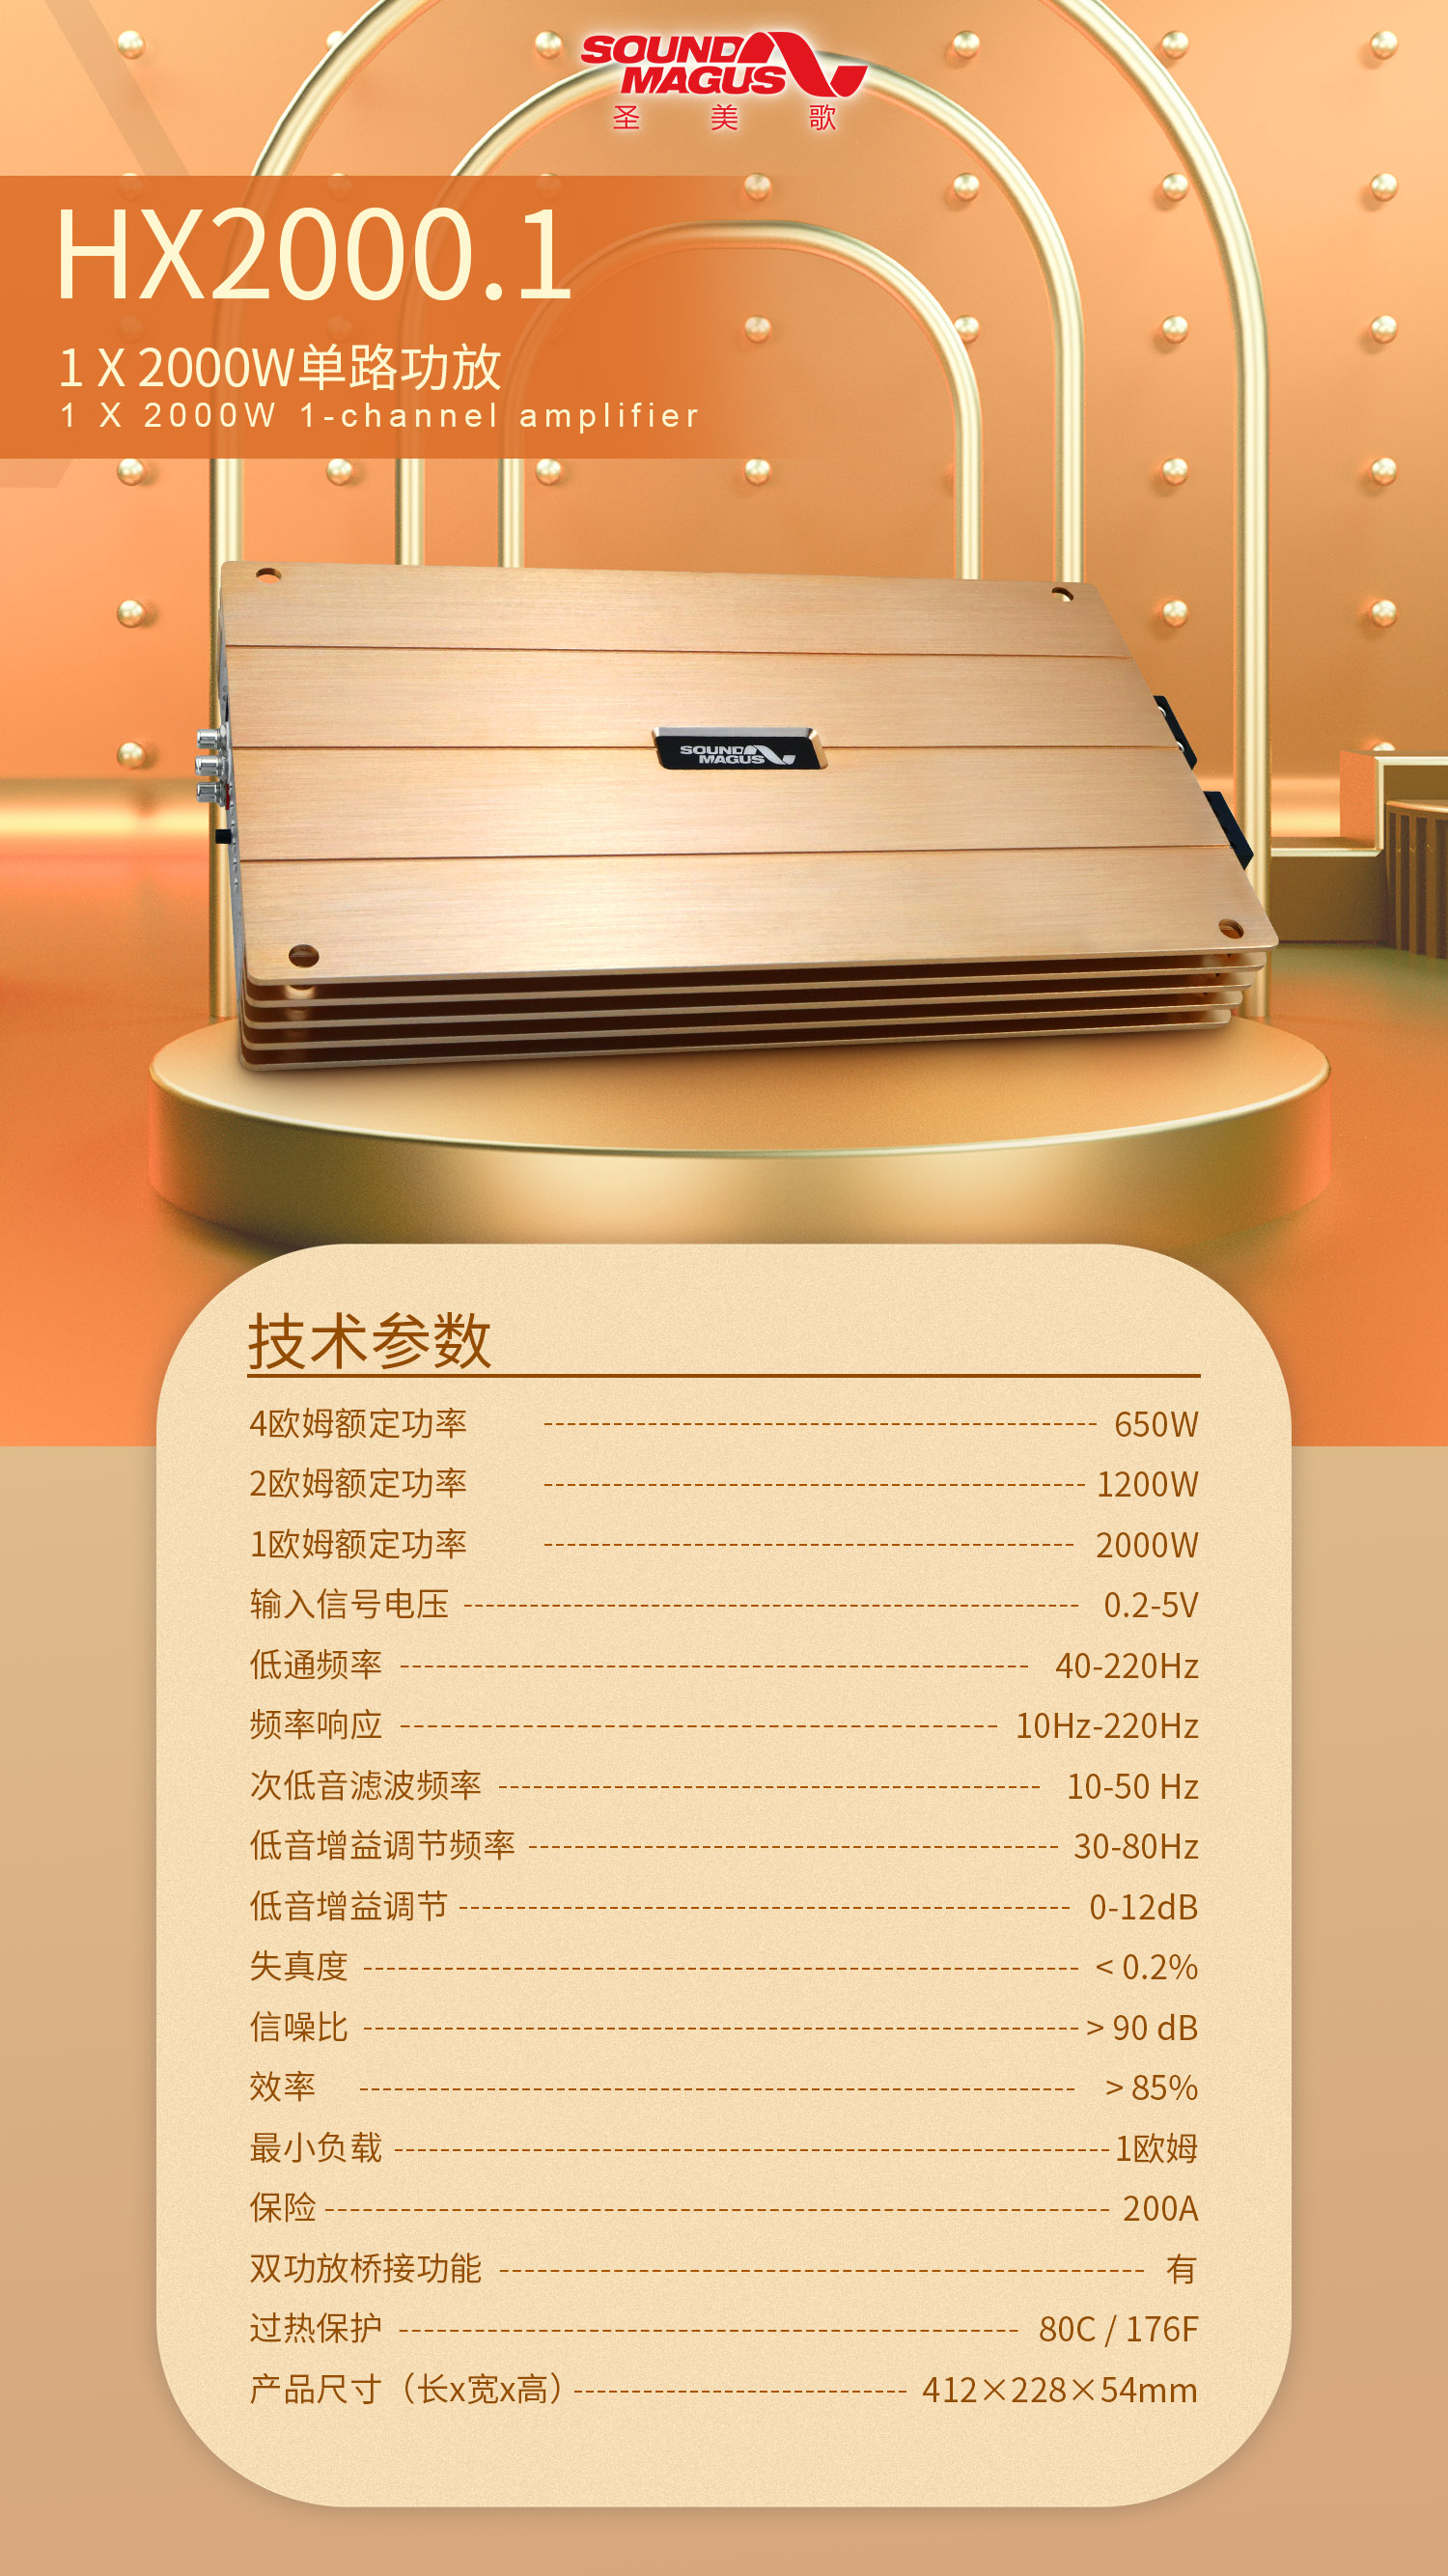 HX2000.1